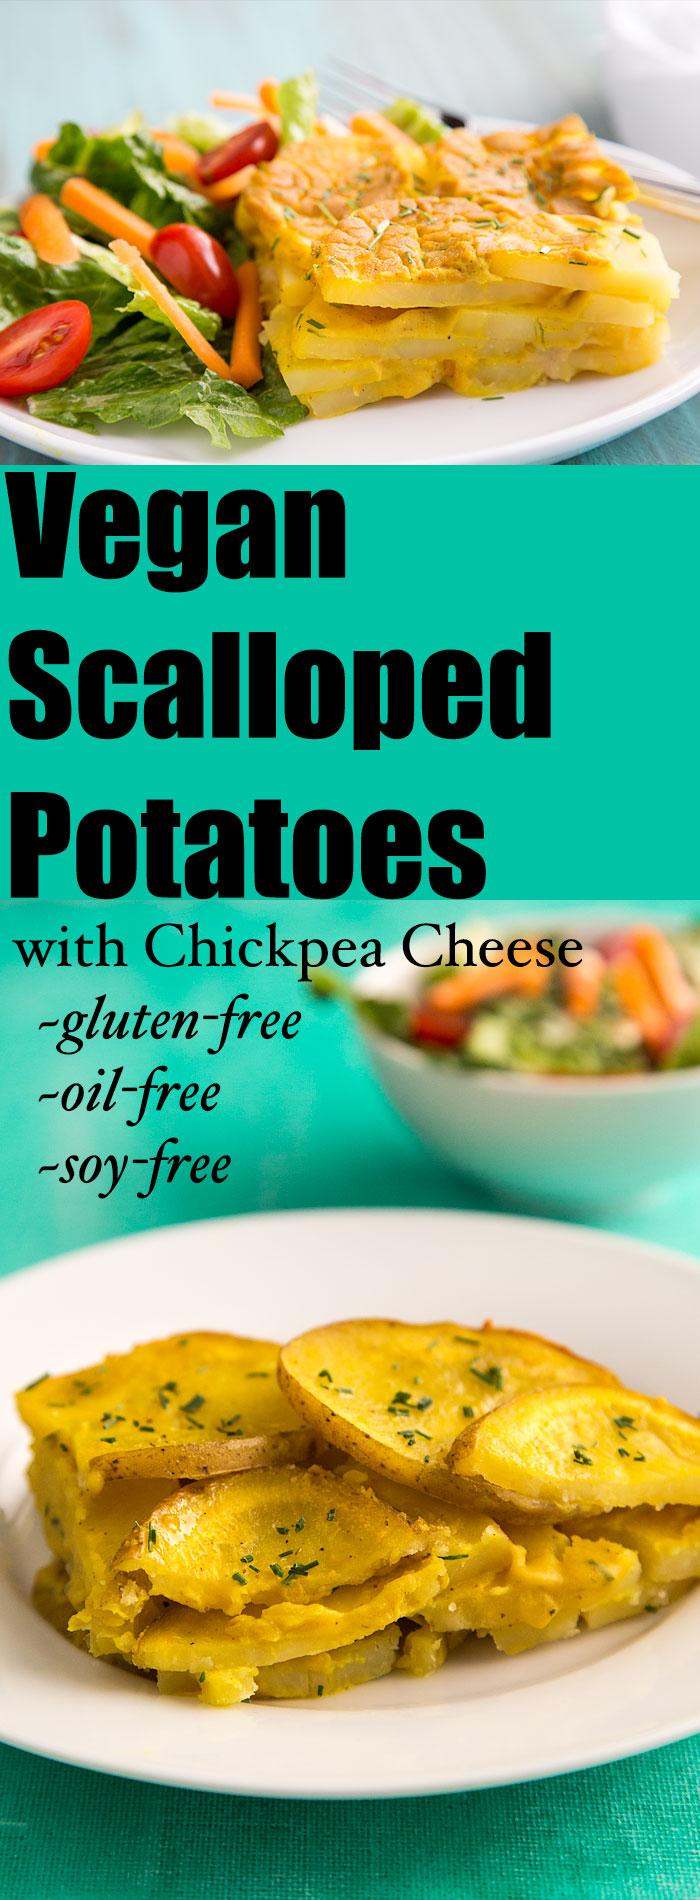 vegan-scalloped-potatoes-chickpea-pin